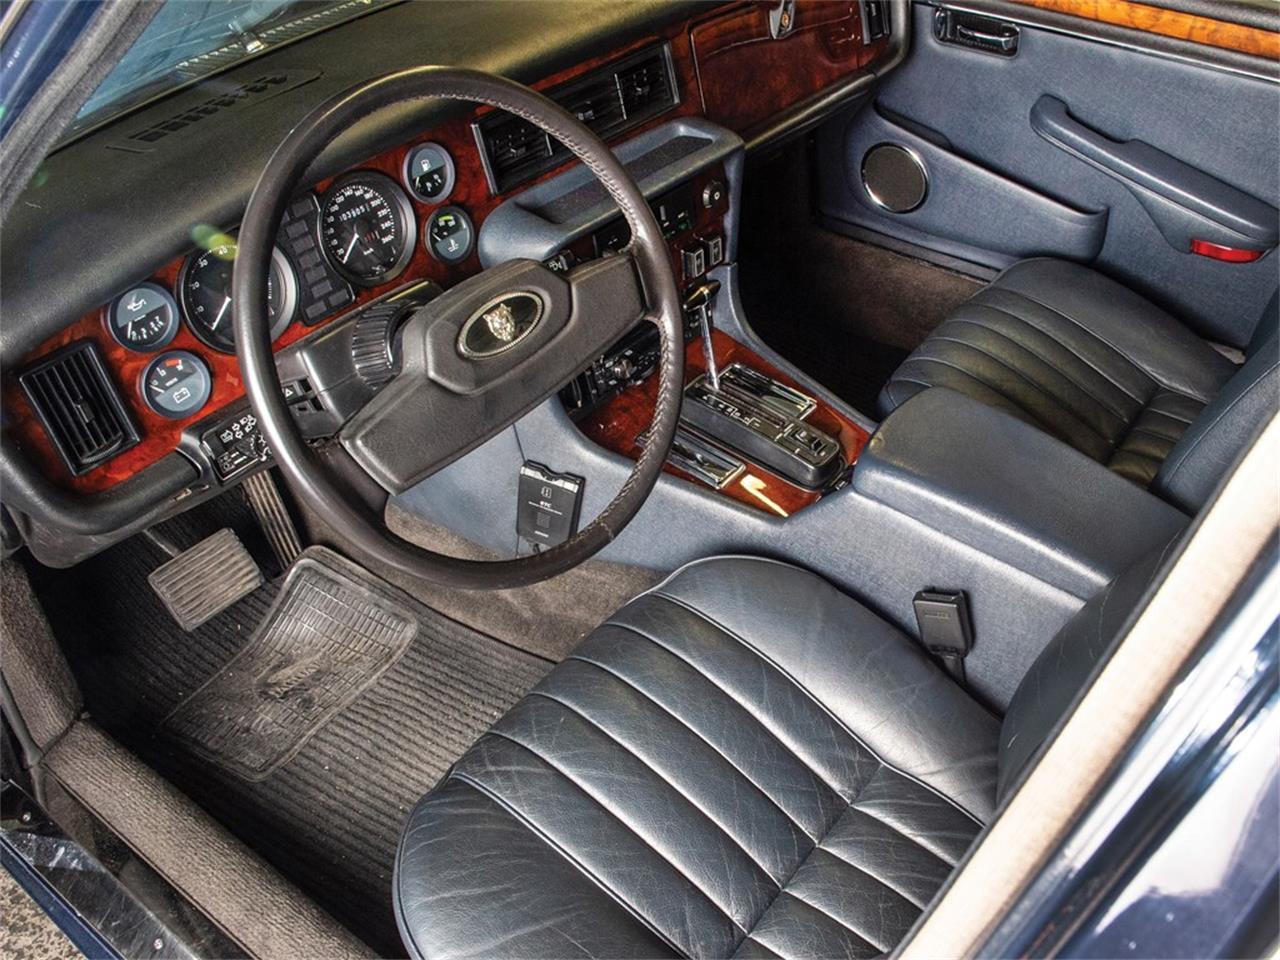 1990 Jaguar XJ12 for sale in Essen / ClassicCarsBay.com